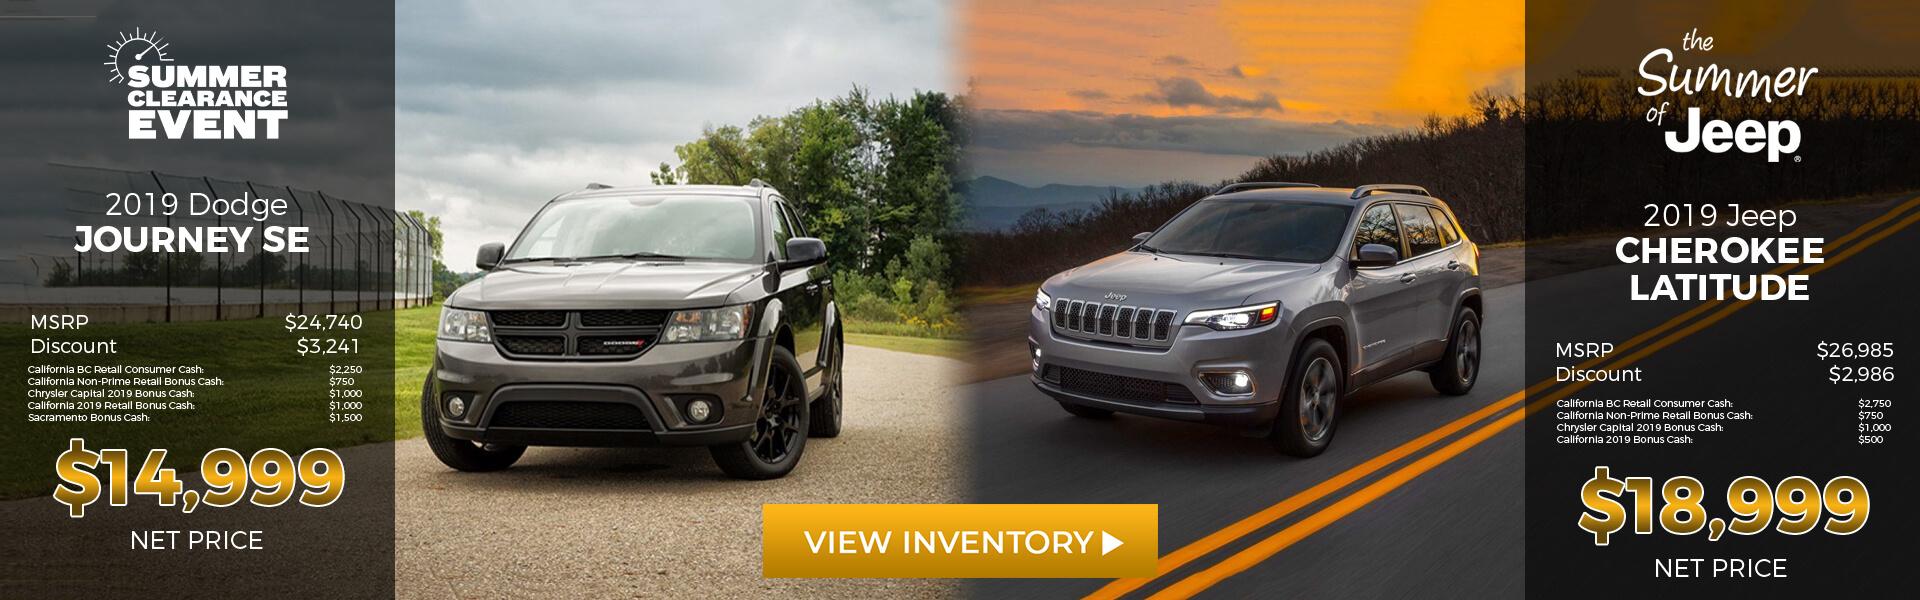 2019 Dodge Journey/2019 Jeep Cherokee